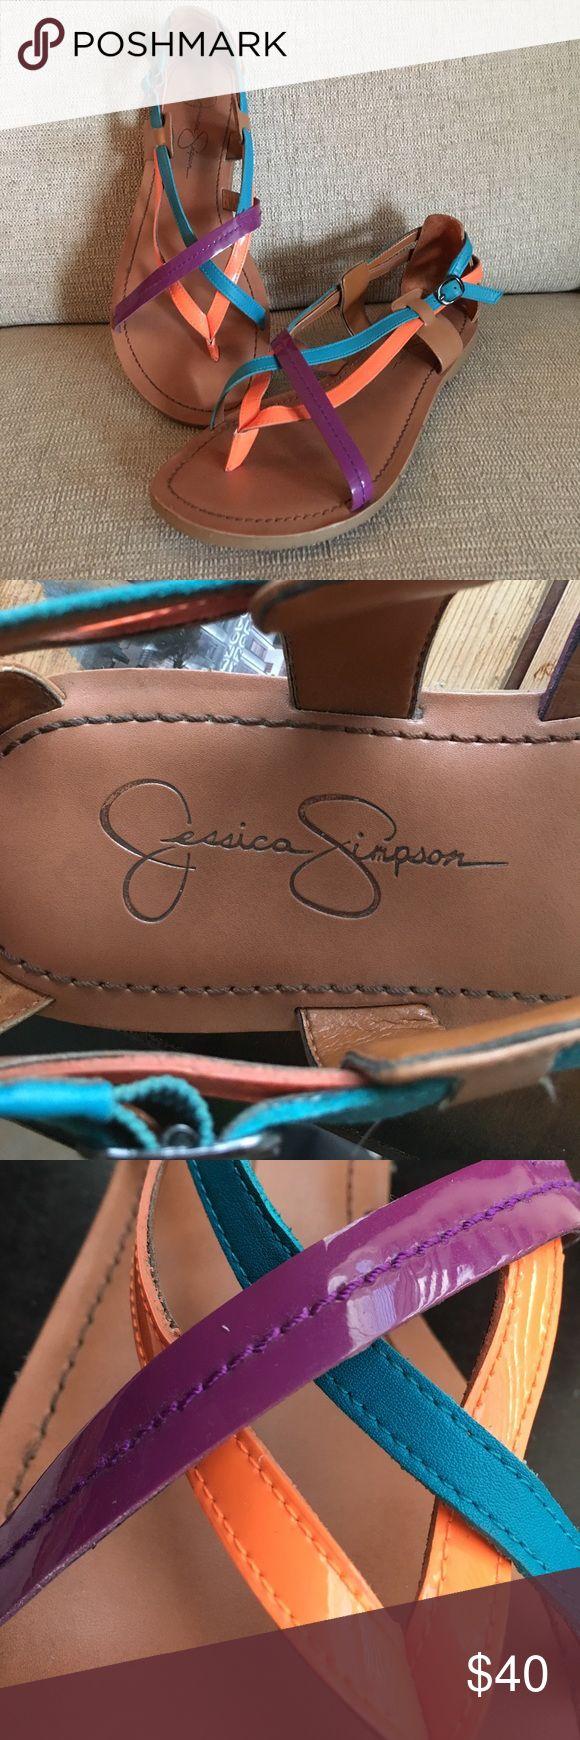 Jessica Simpson Sandals Jessica Simpson Multicolor Flat Sandals. Worn once, great condition. Jessica Simpson Shoes Sandals